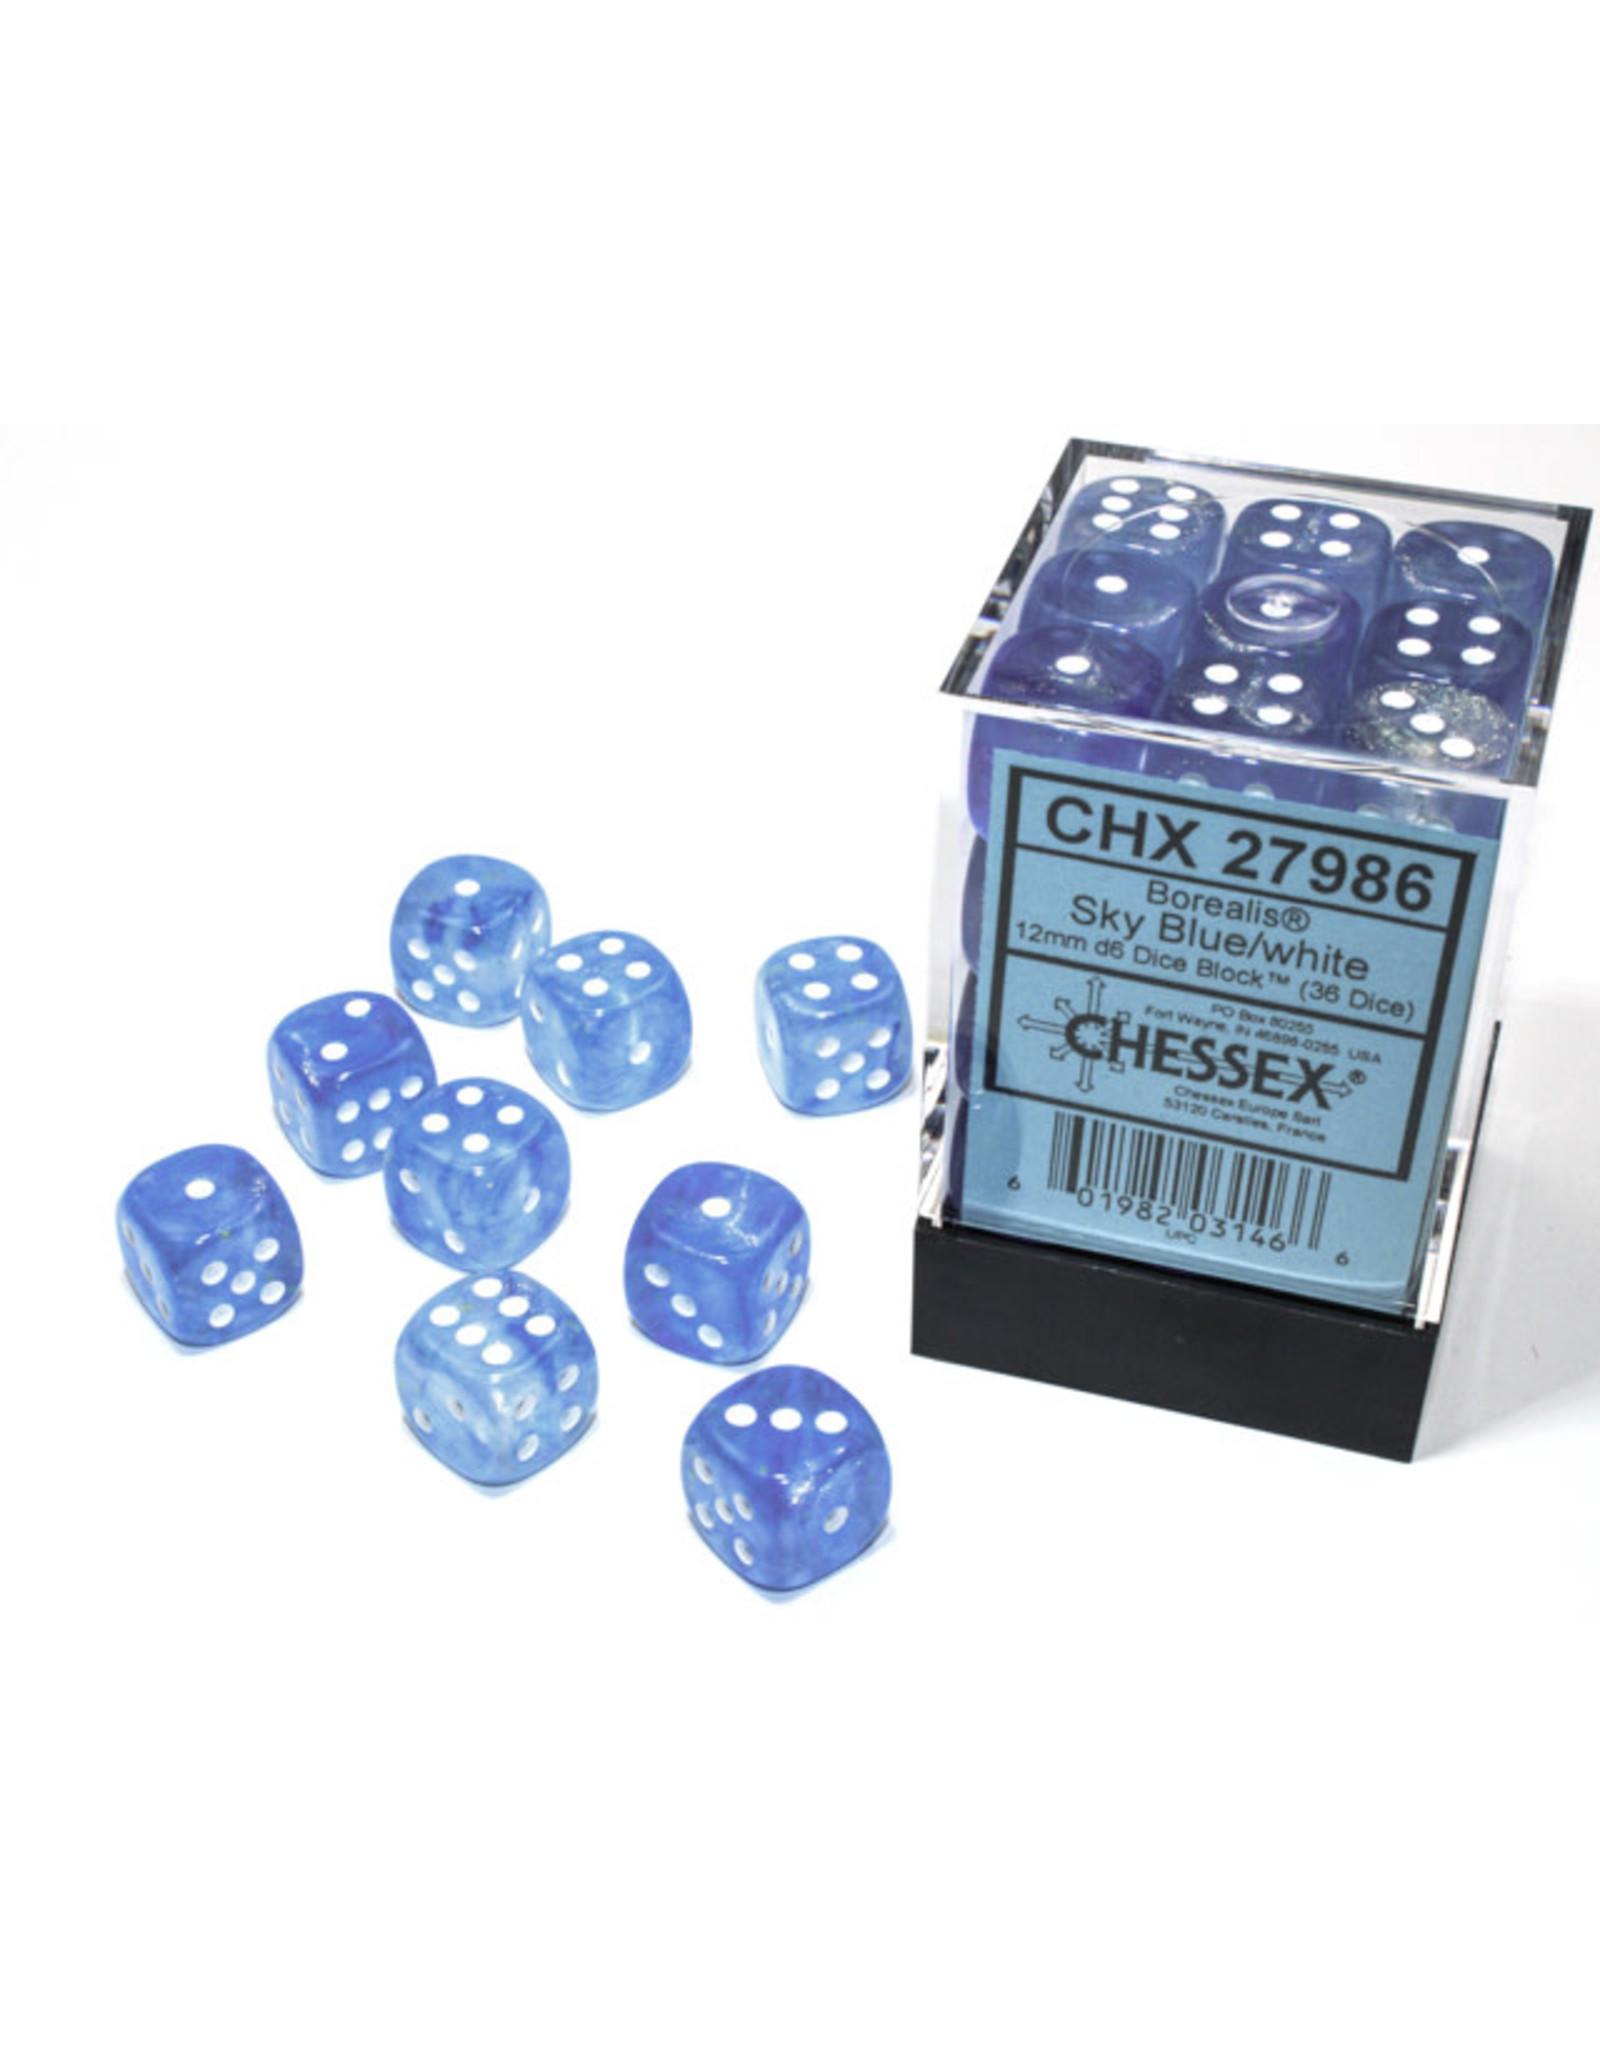 Chessex Borealis: 12mm d6 Sky Blue/white Luminary Dice Block (36 dice) CHX 27986